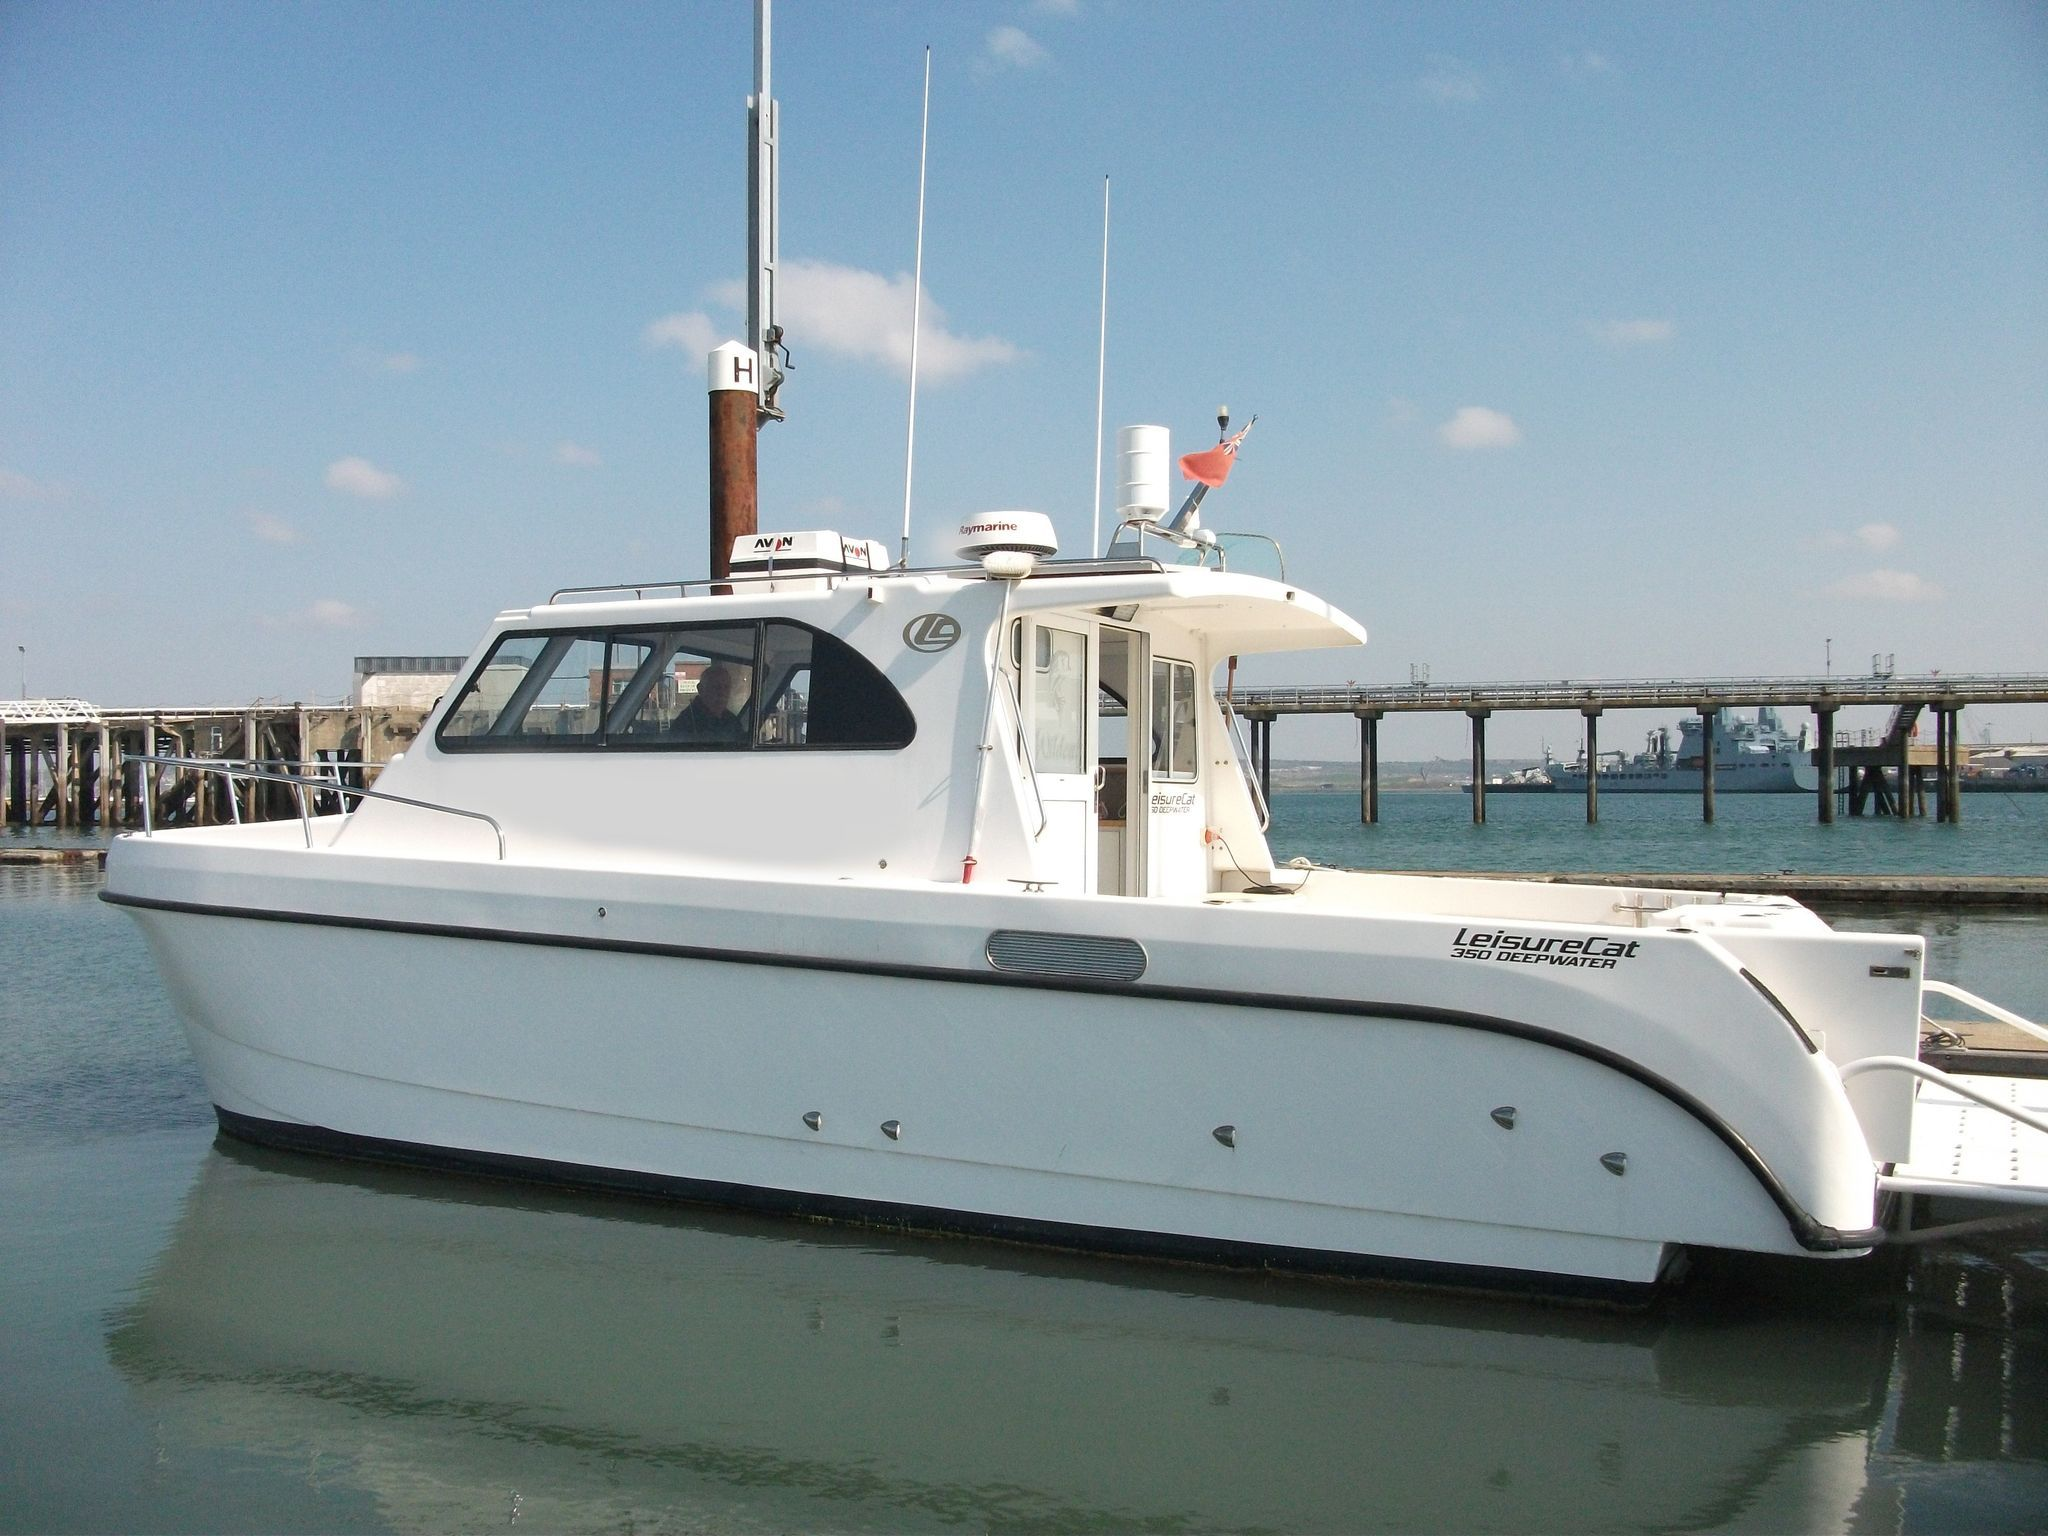 LeisureCat 350 deep water